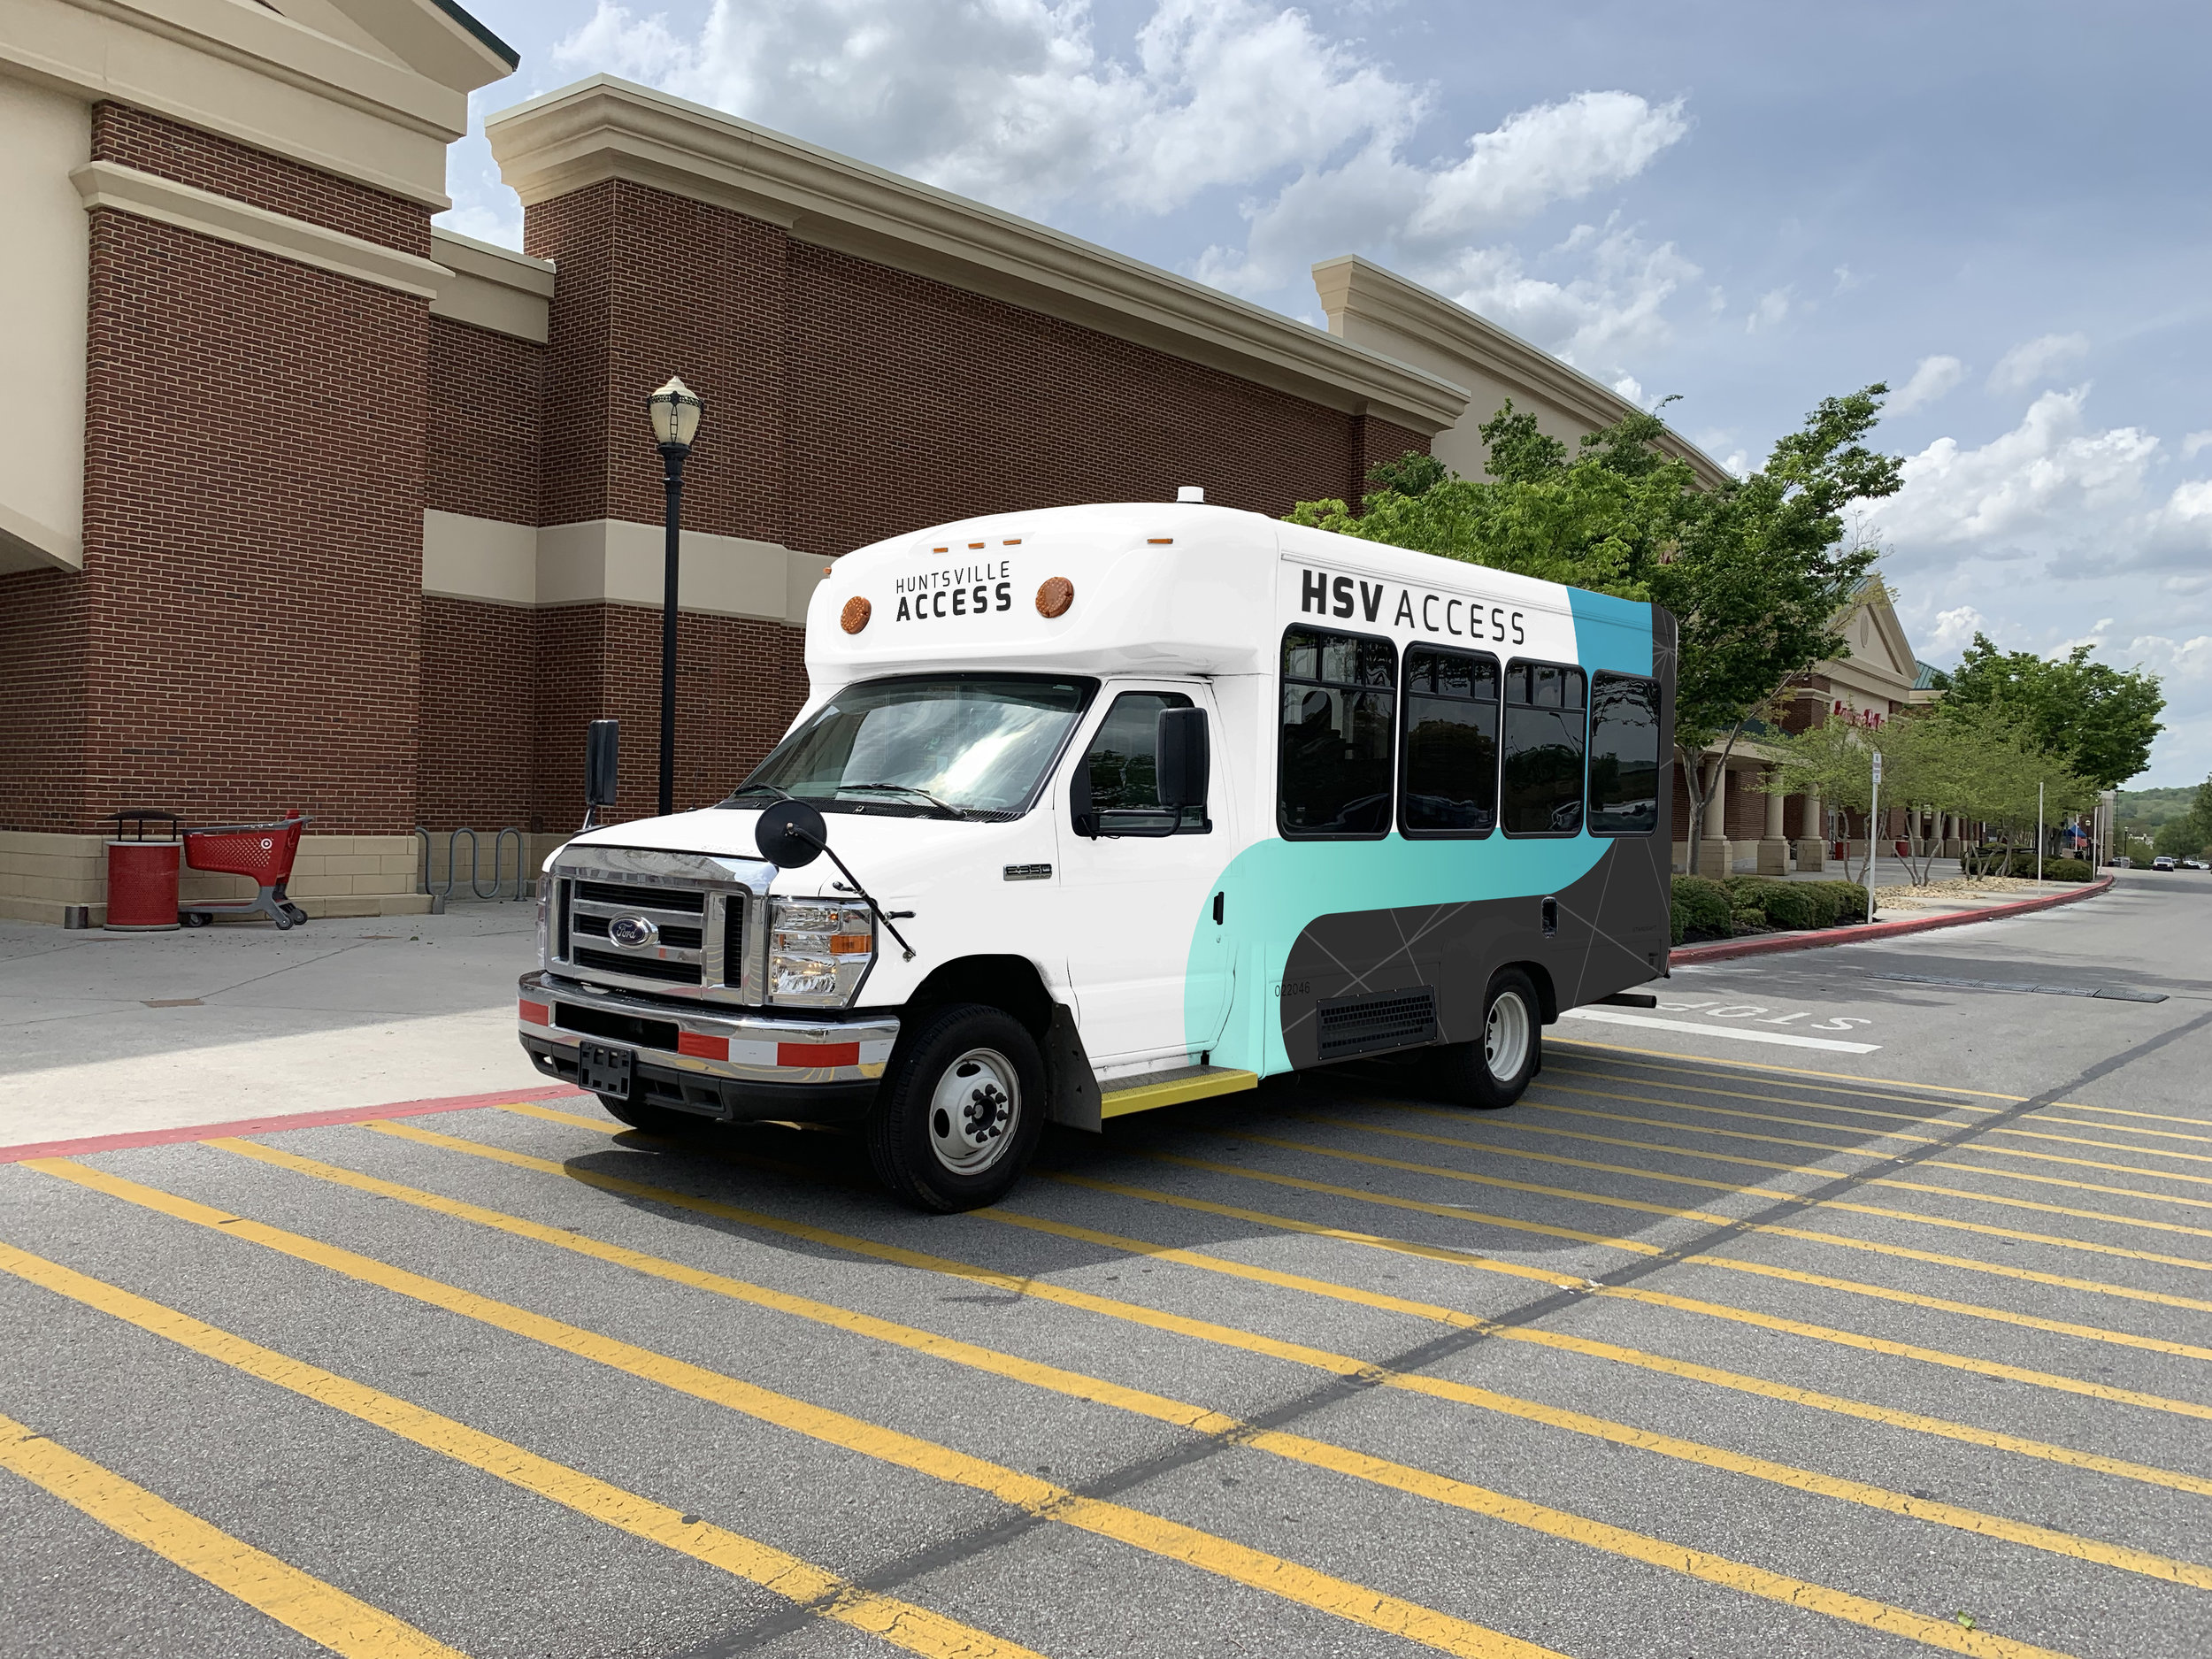 CityofHSV_PublicTransit_Rebrand_CONCEPT1_HuntsvilleAccess_R1-v4-mockup.jpg